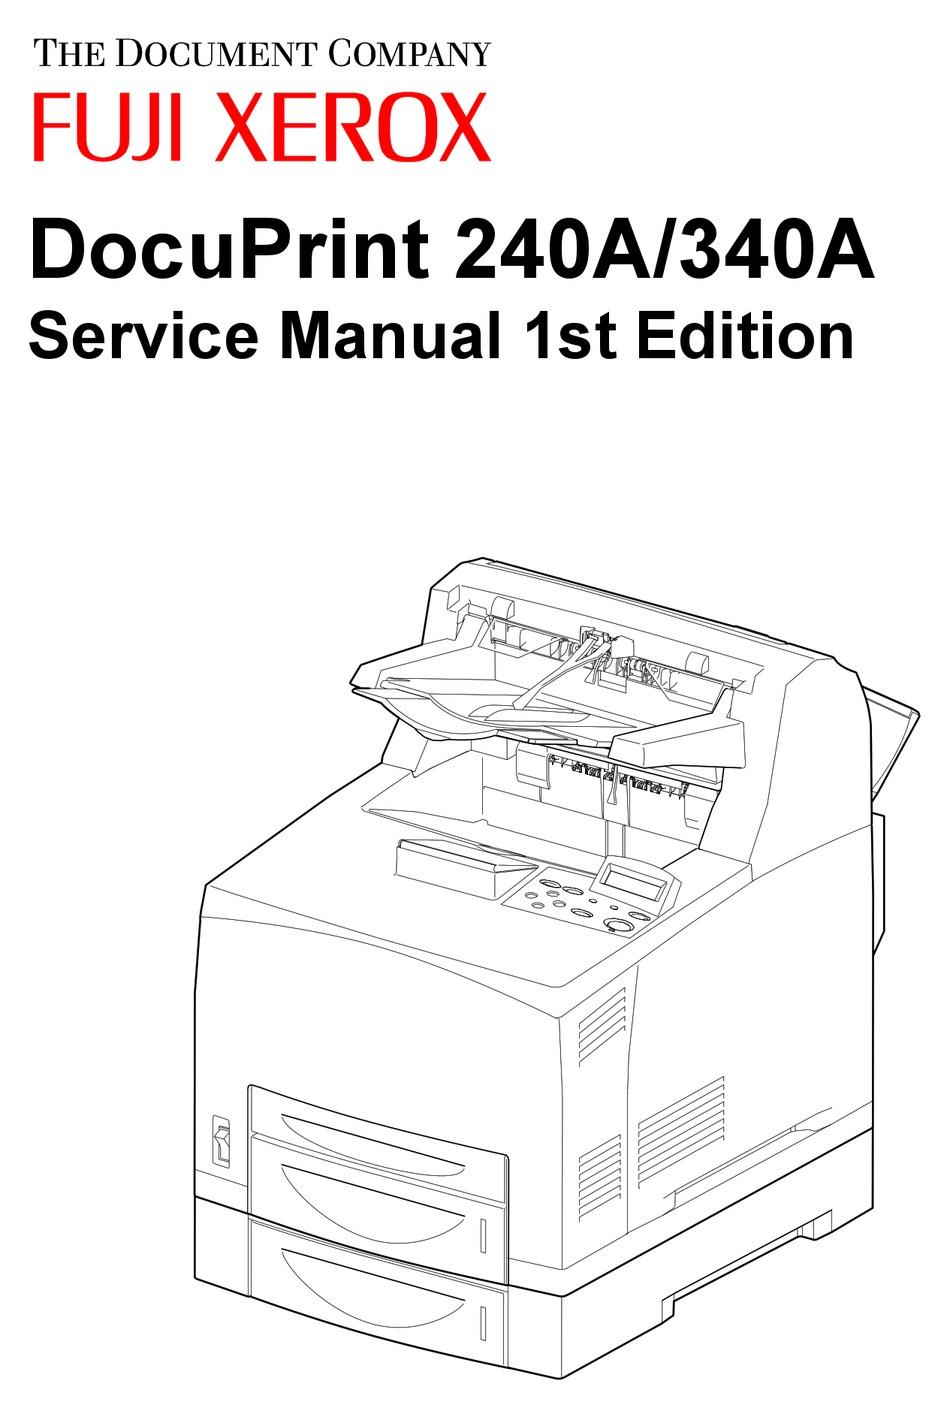 FUJI XEROX DOCUPRINT 240A SERVICE MANUAL Pdf Download